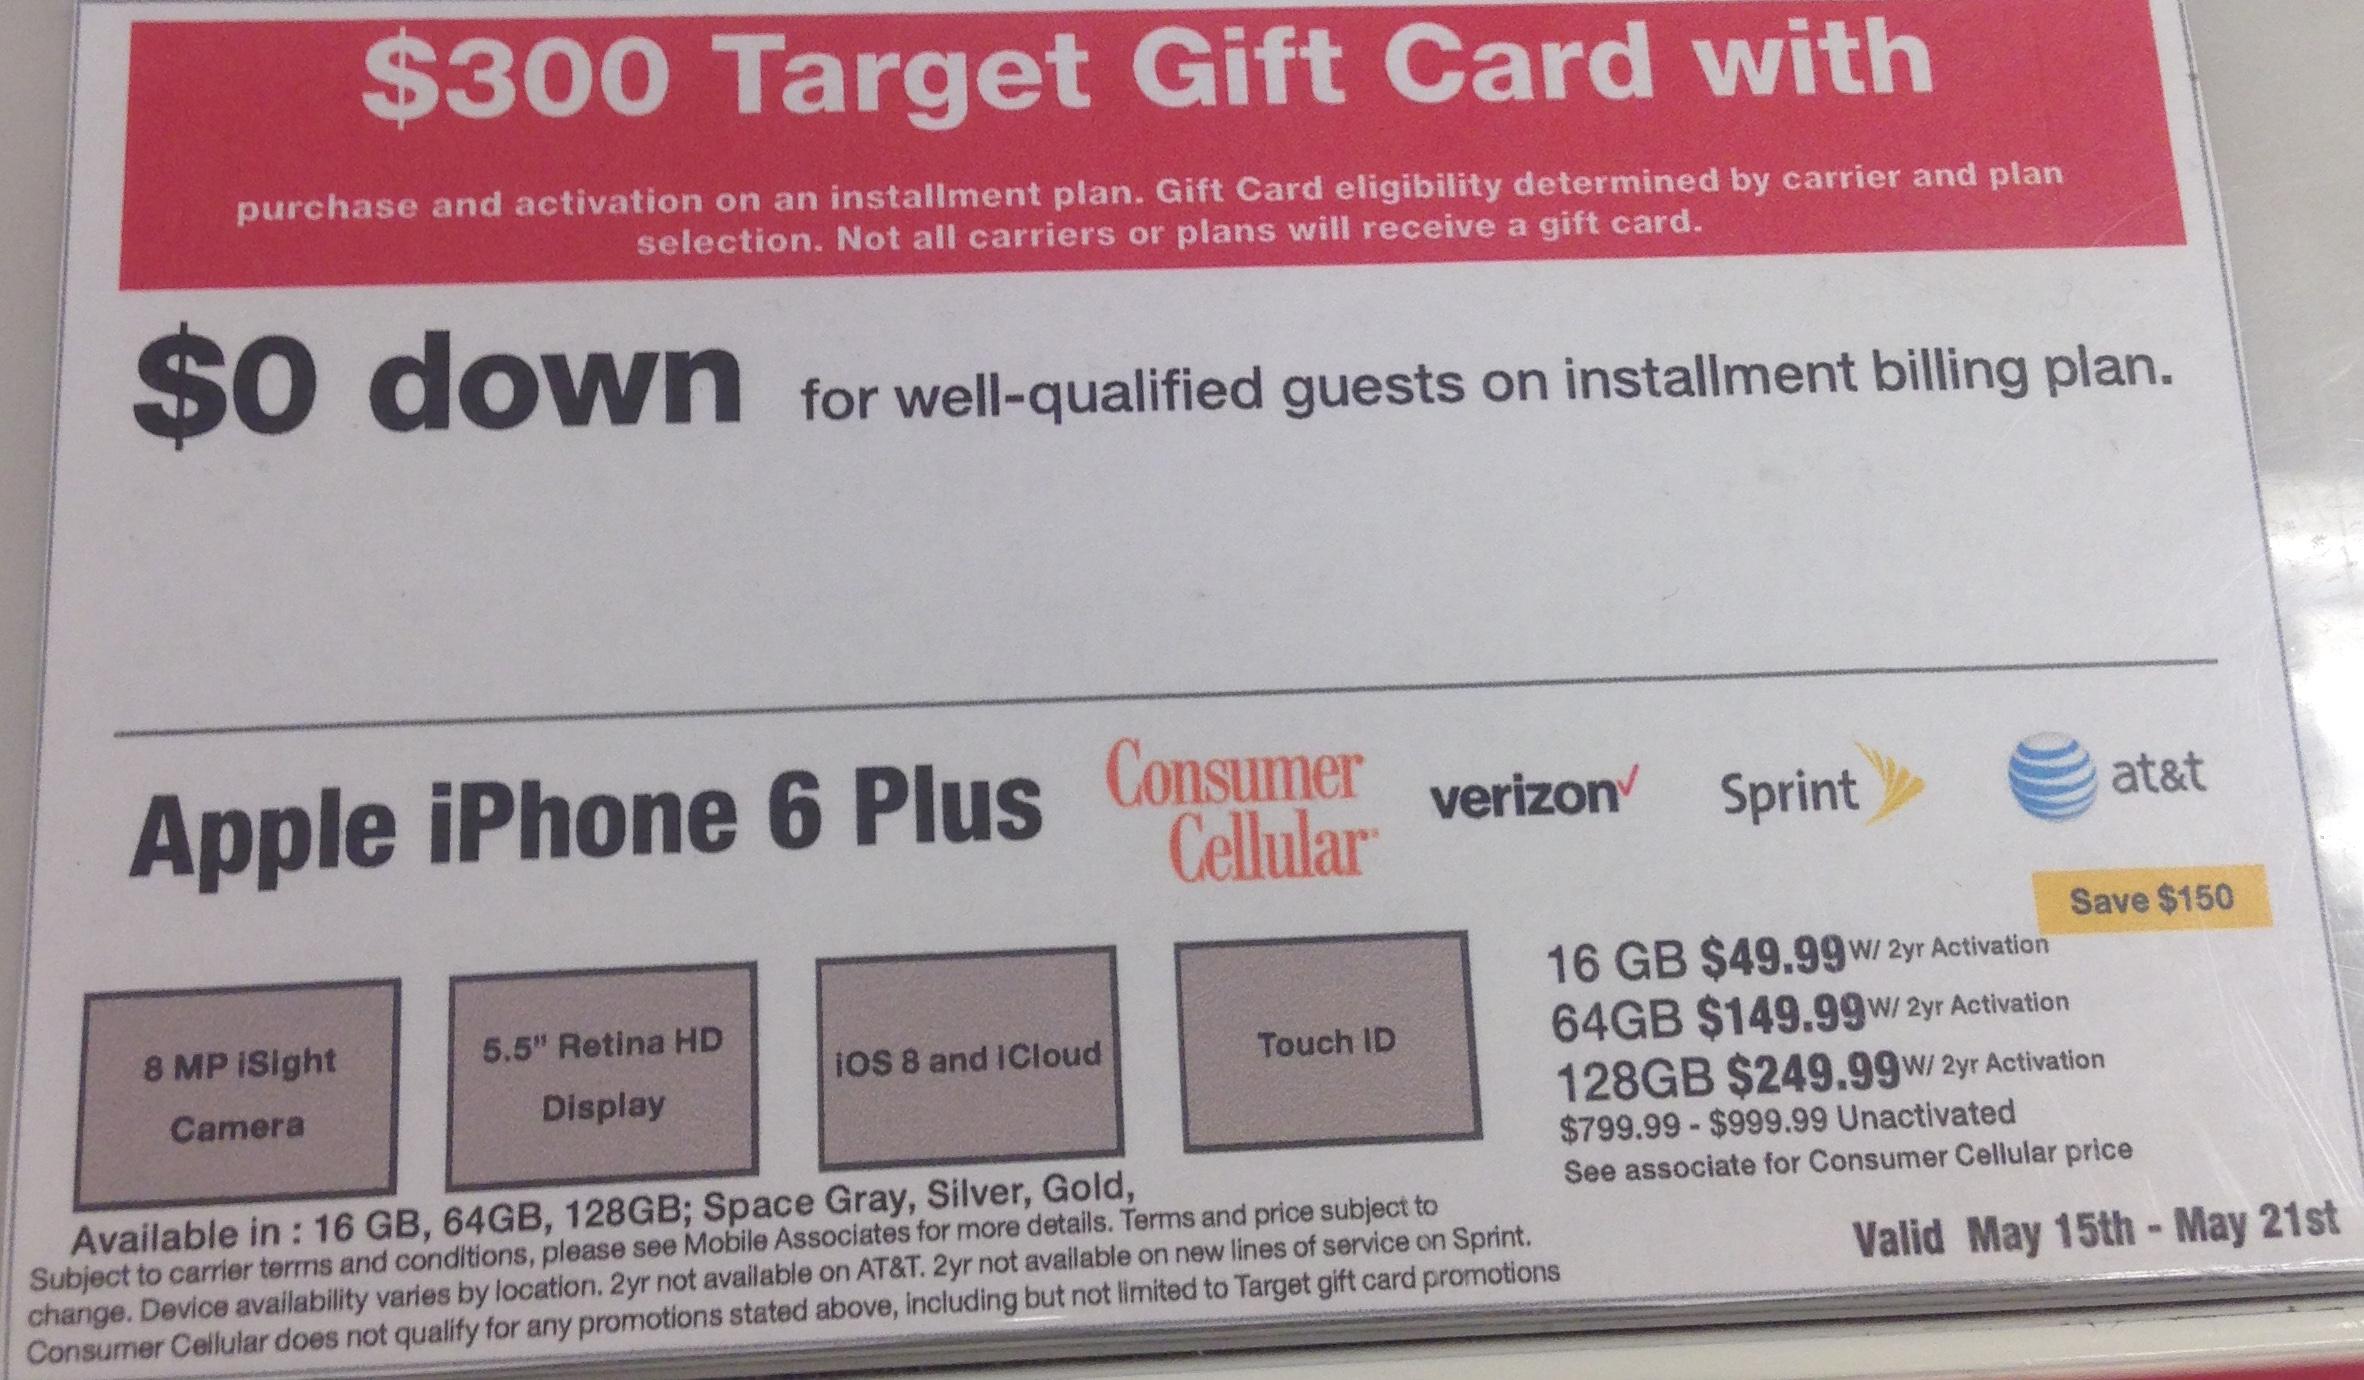 iPhone 6/6 Plus: $250/$300 Target Gift Card on Installment Billing Plan